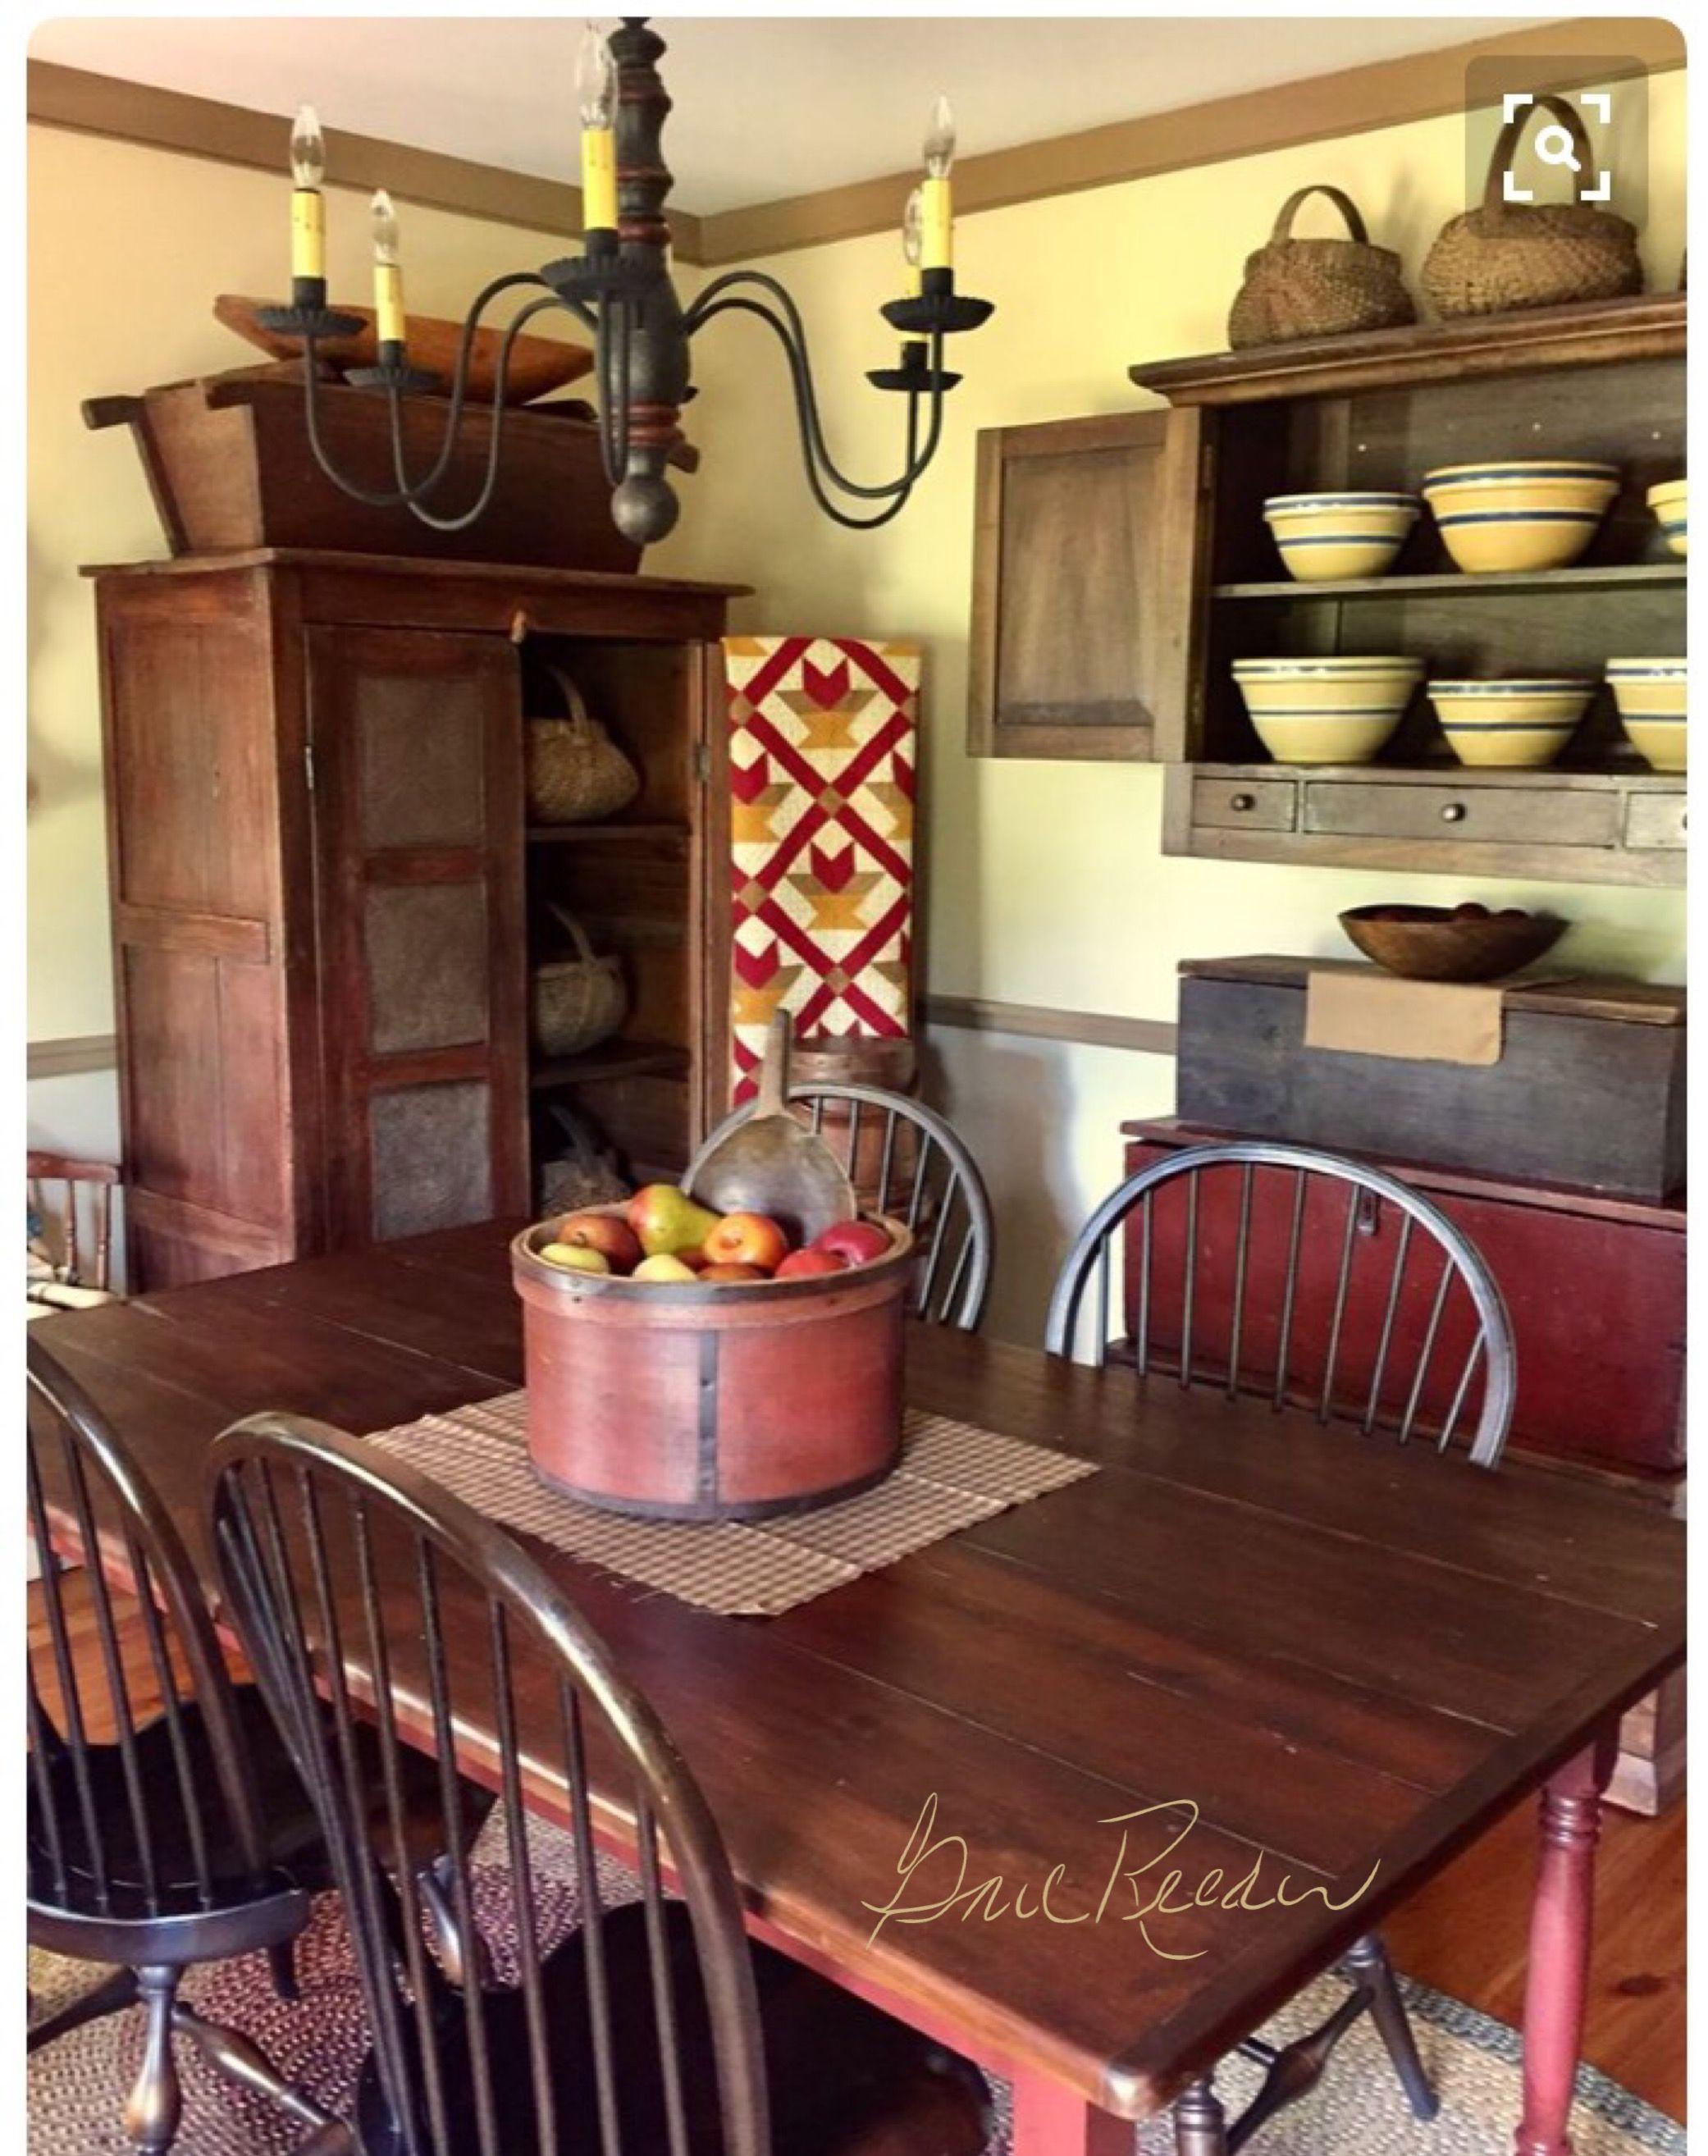 yellow ware bowls | house pictures | Pinterest | Comedores y Decoración